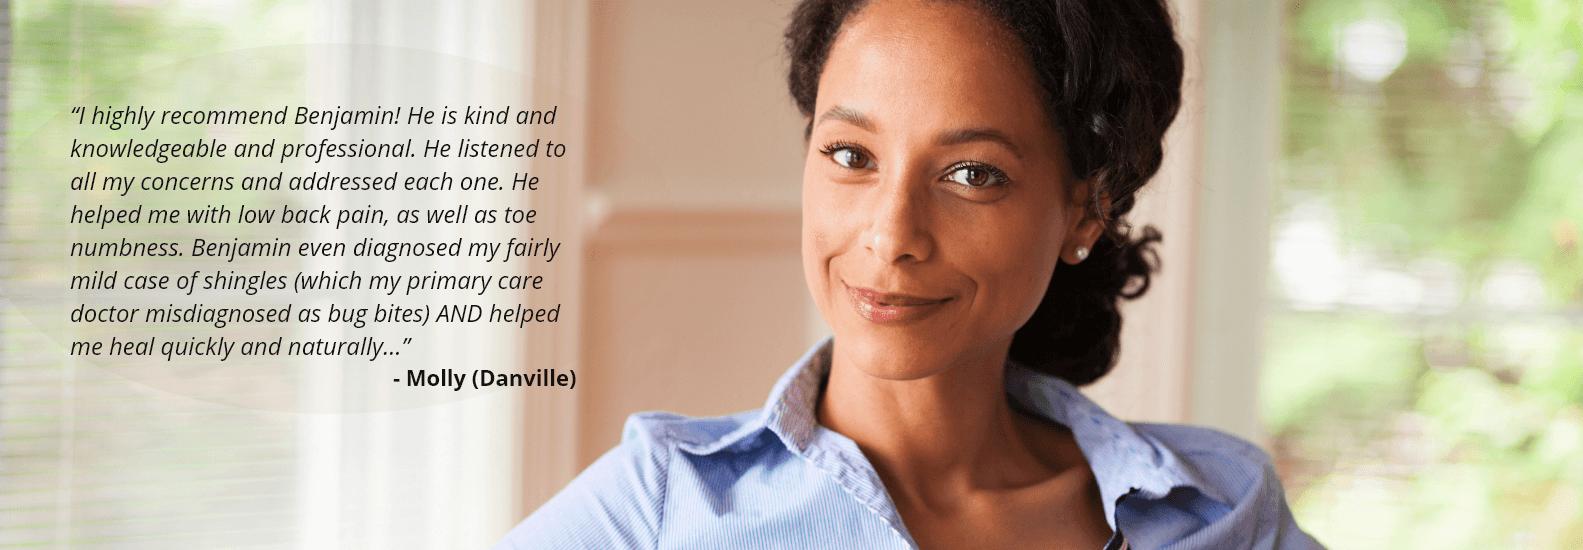 Molly (Danville) Testimonial - Acupuncture in Lafayette CA | Benjamin Dierauf